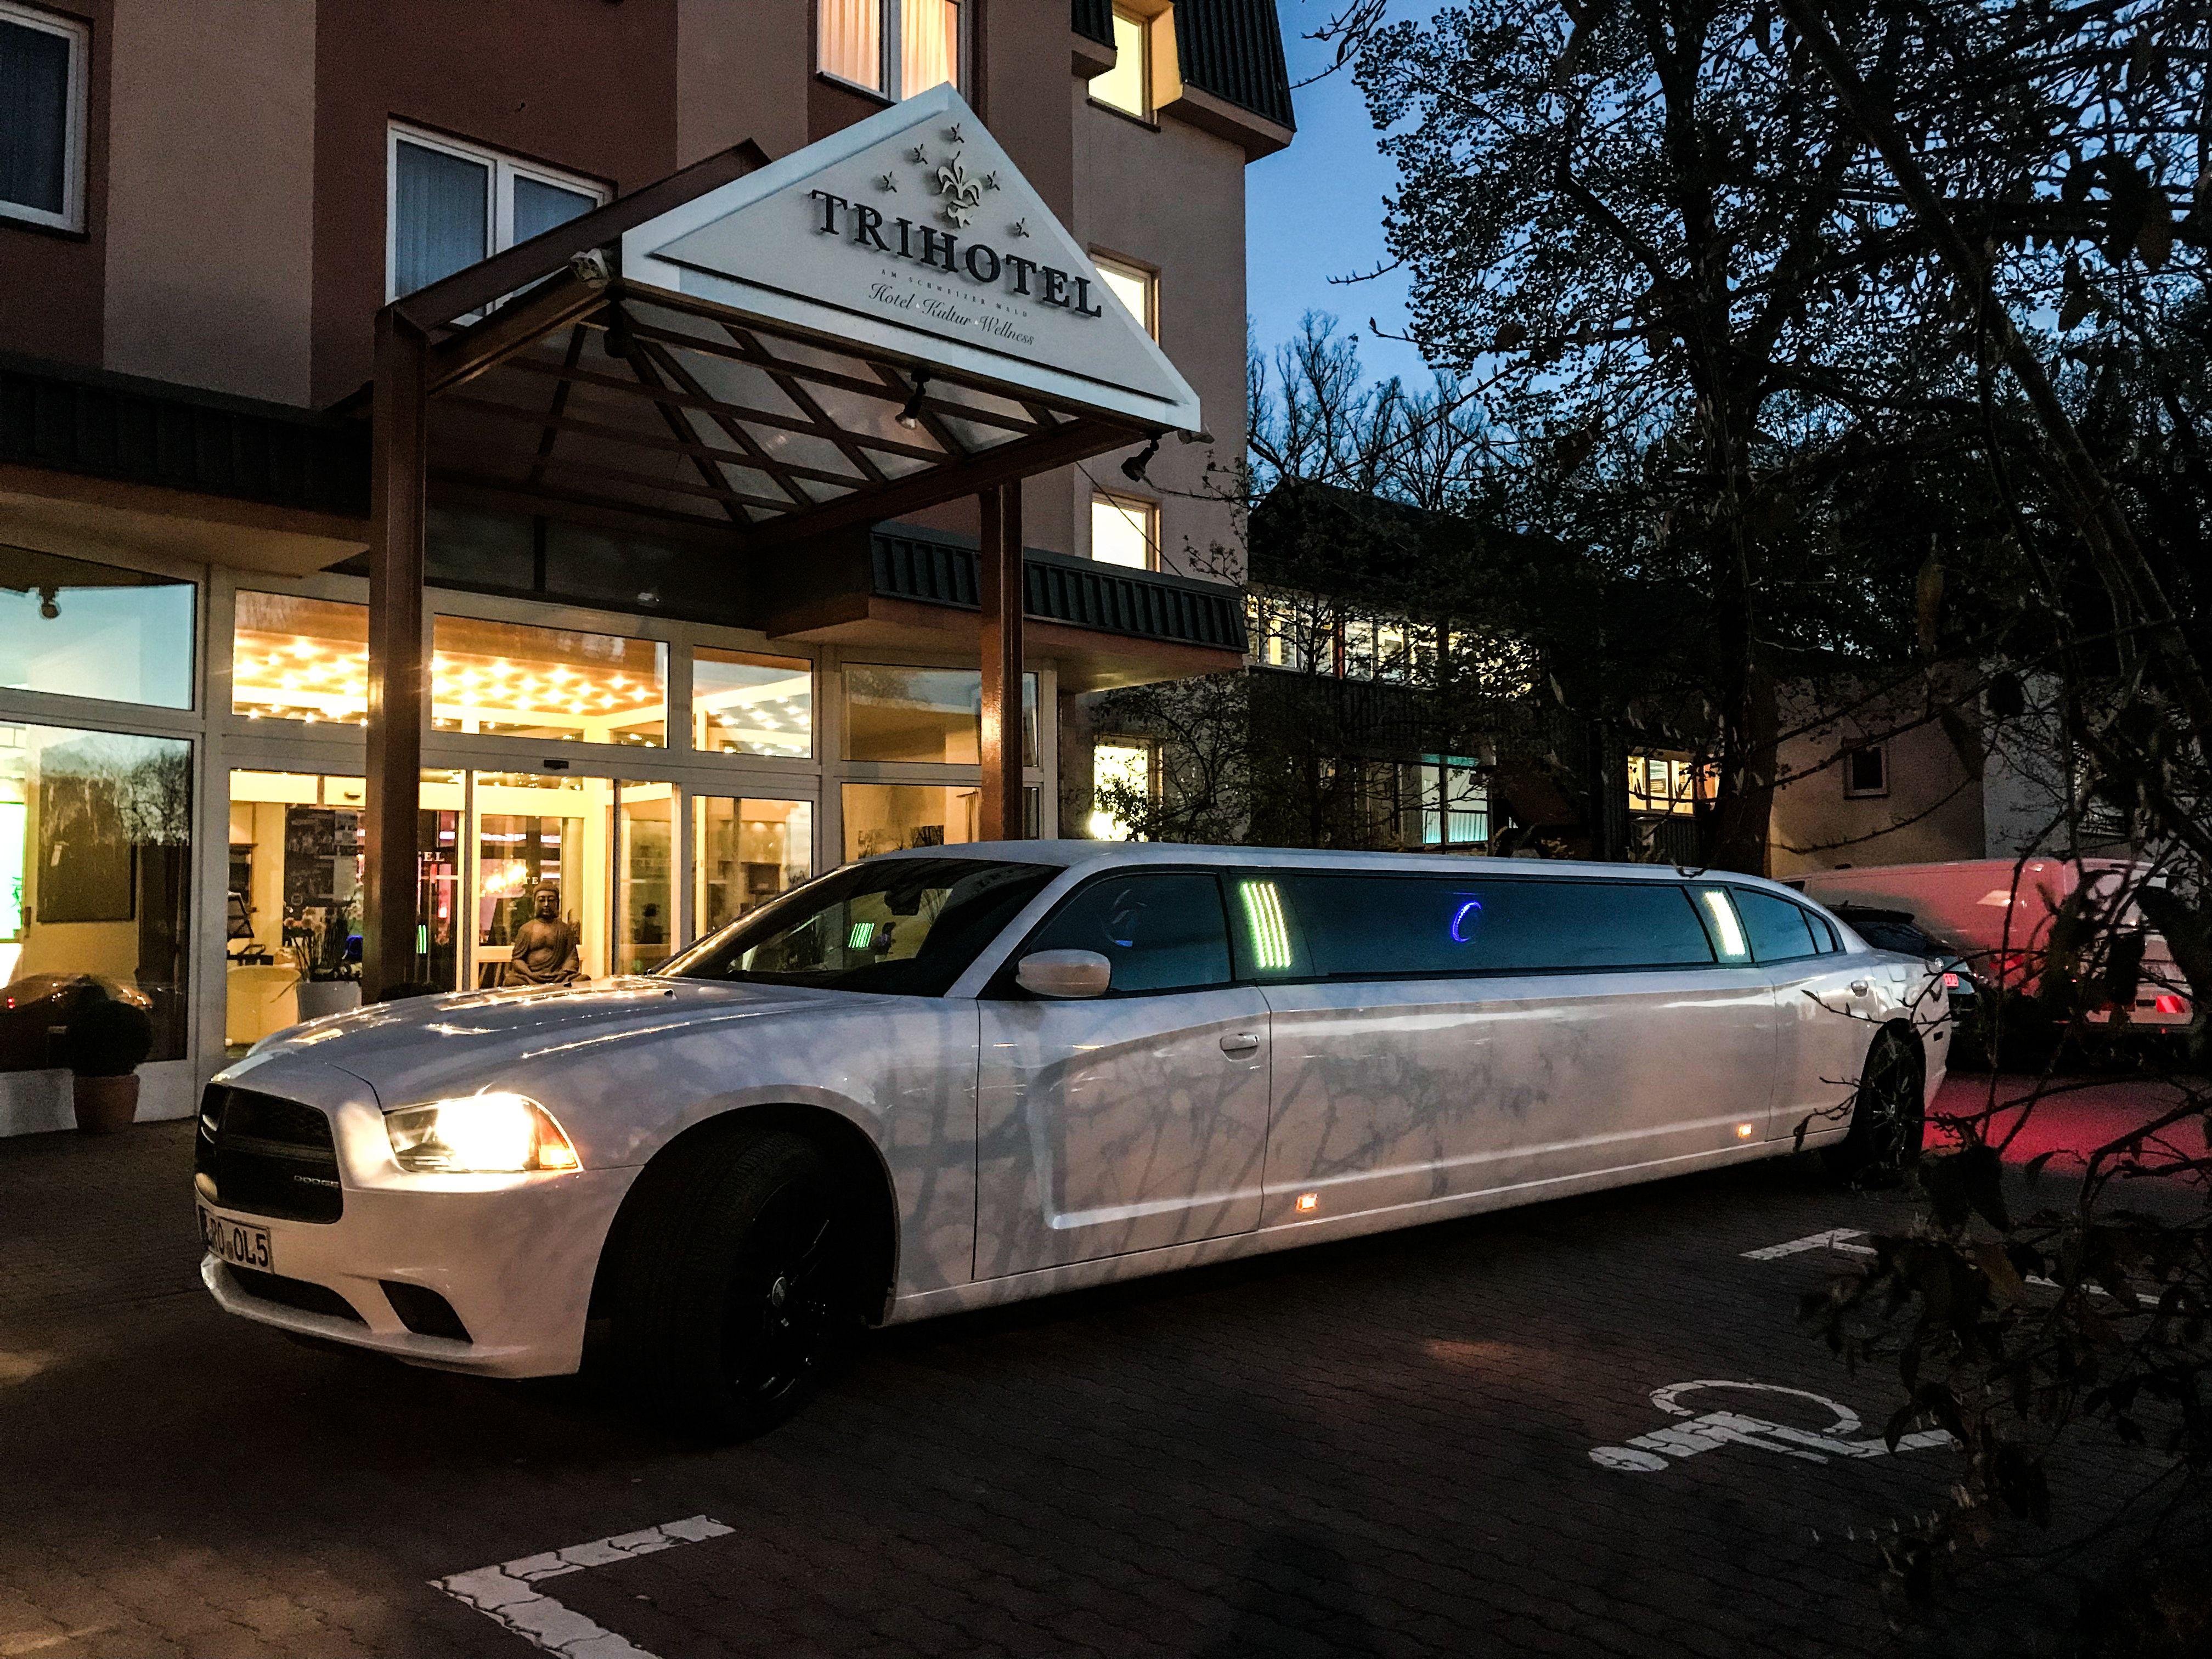 Trihotel Rostock Hotel Am Schweizer Wald Hotel Limousinenservice Stretchlimousine Limousinenservice Limousine